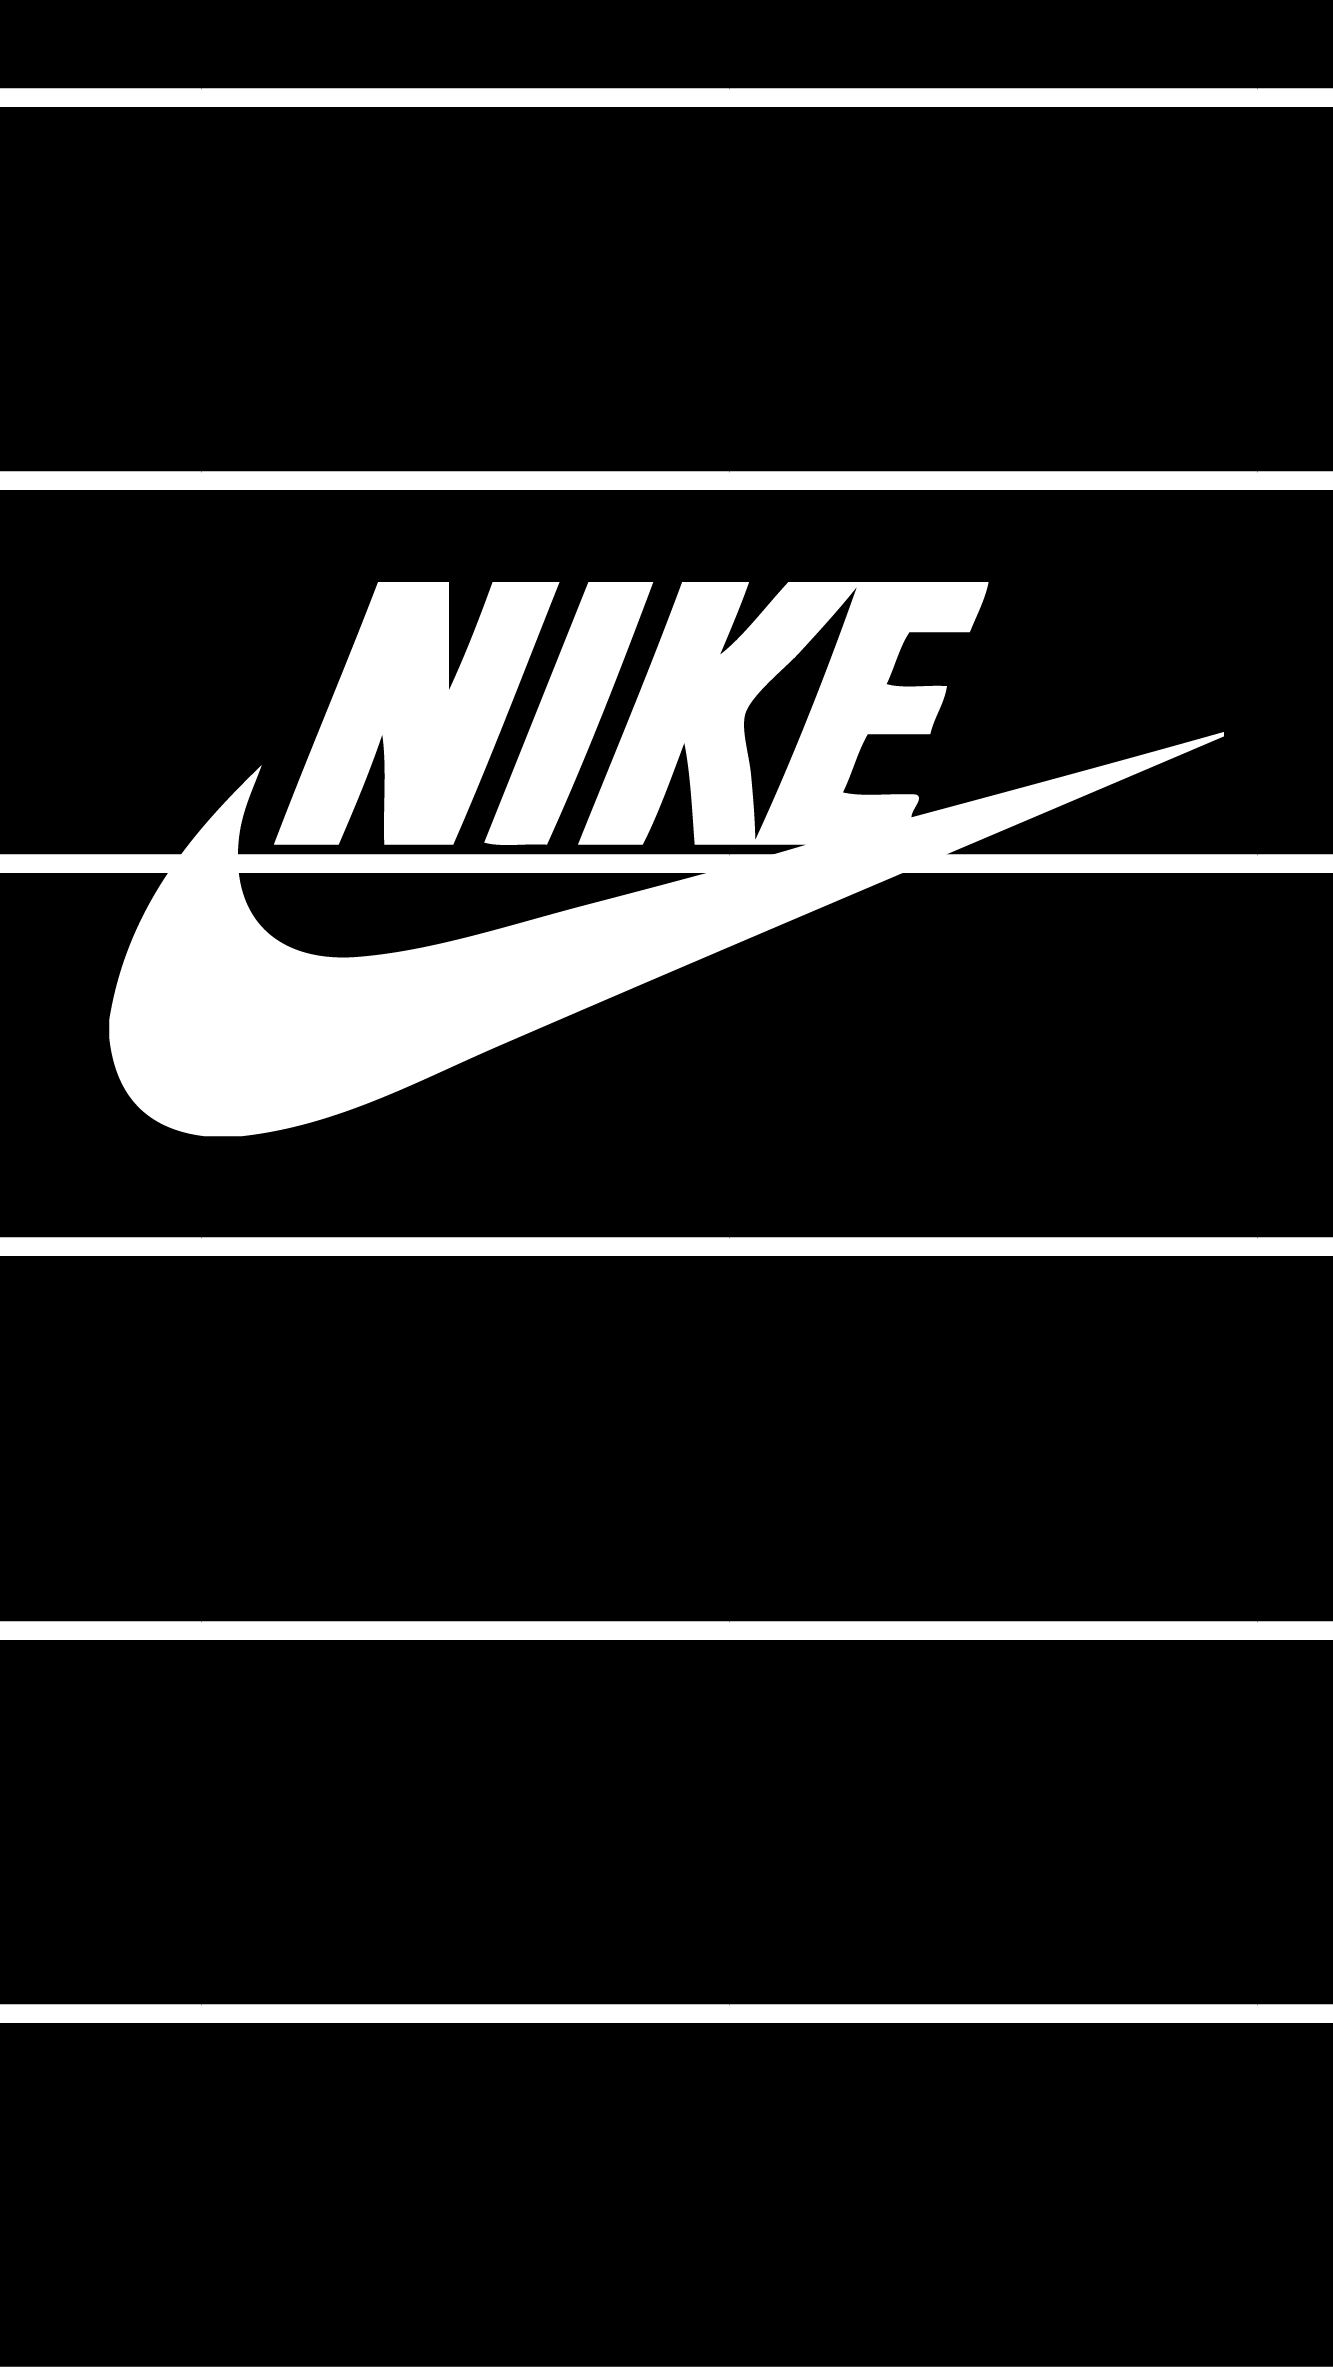 Nike Wallpaper 2 Nike wallpaper, Nike, Nike wallpaper iphone